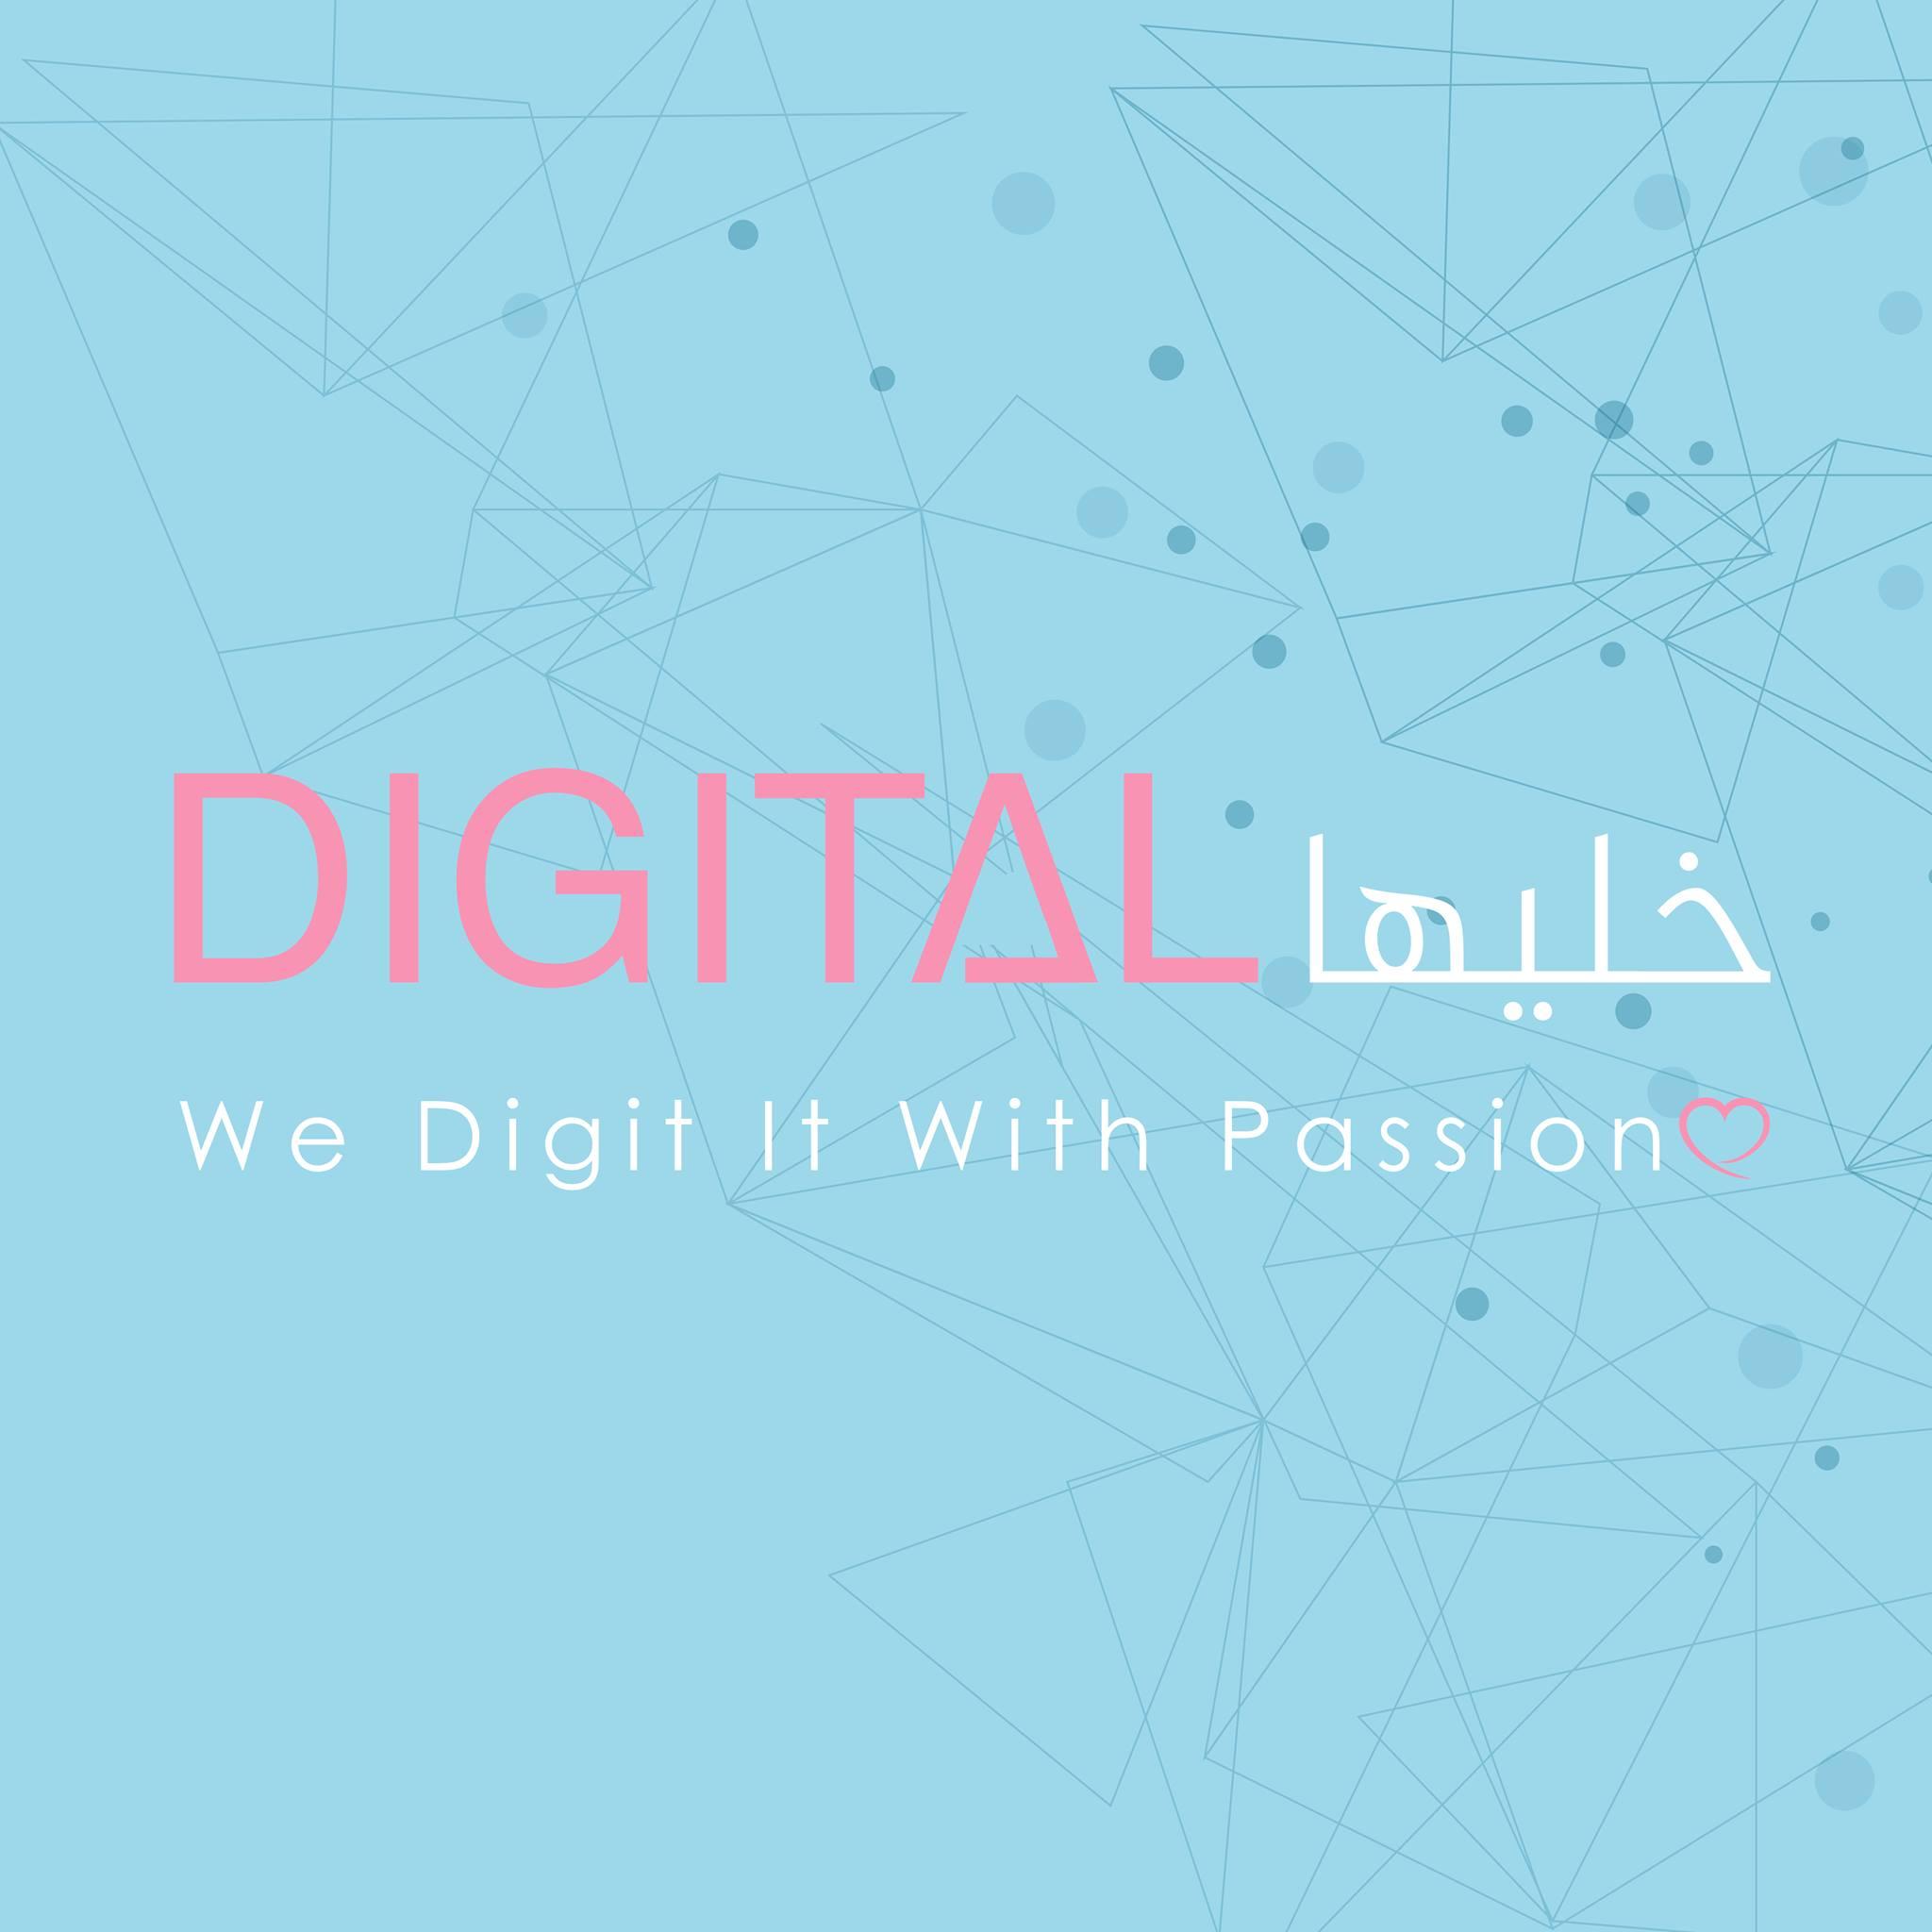 خليها Digital